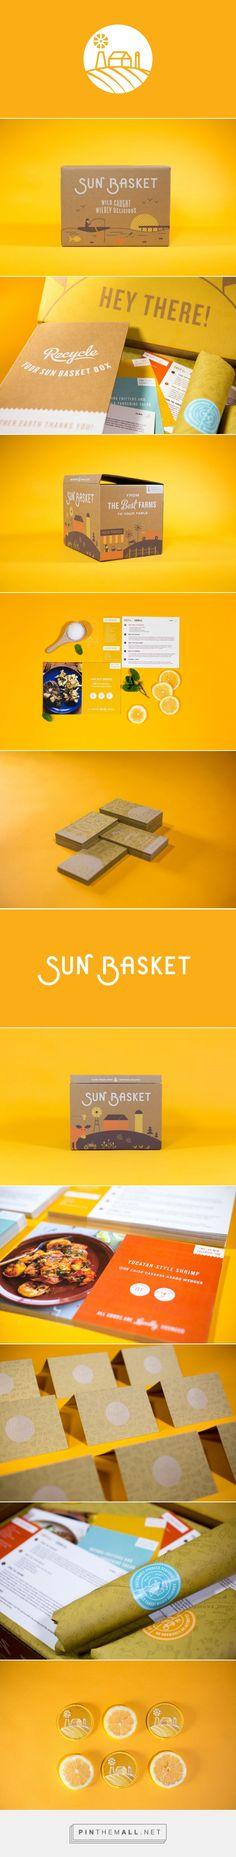 Sun Basket — The Dieline - Branding & Packaging - created via https://pinthemall.net